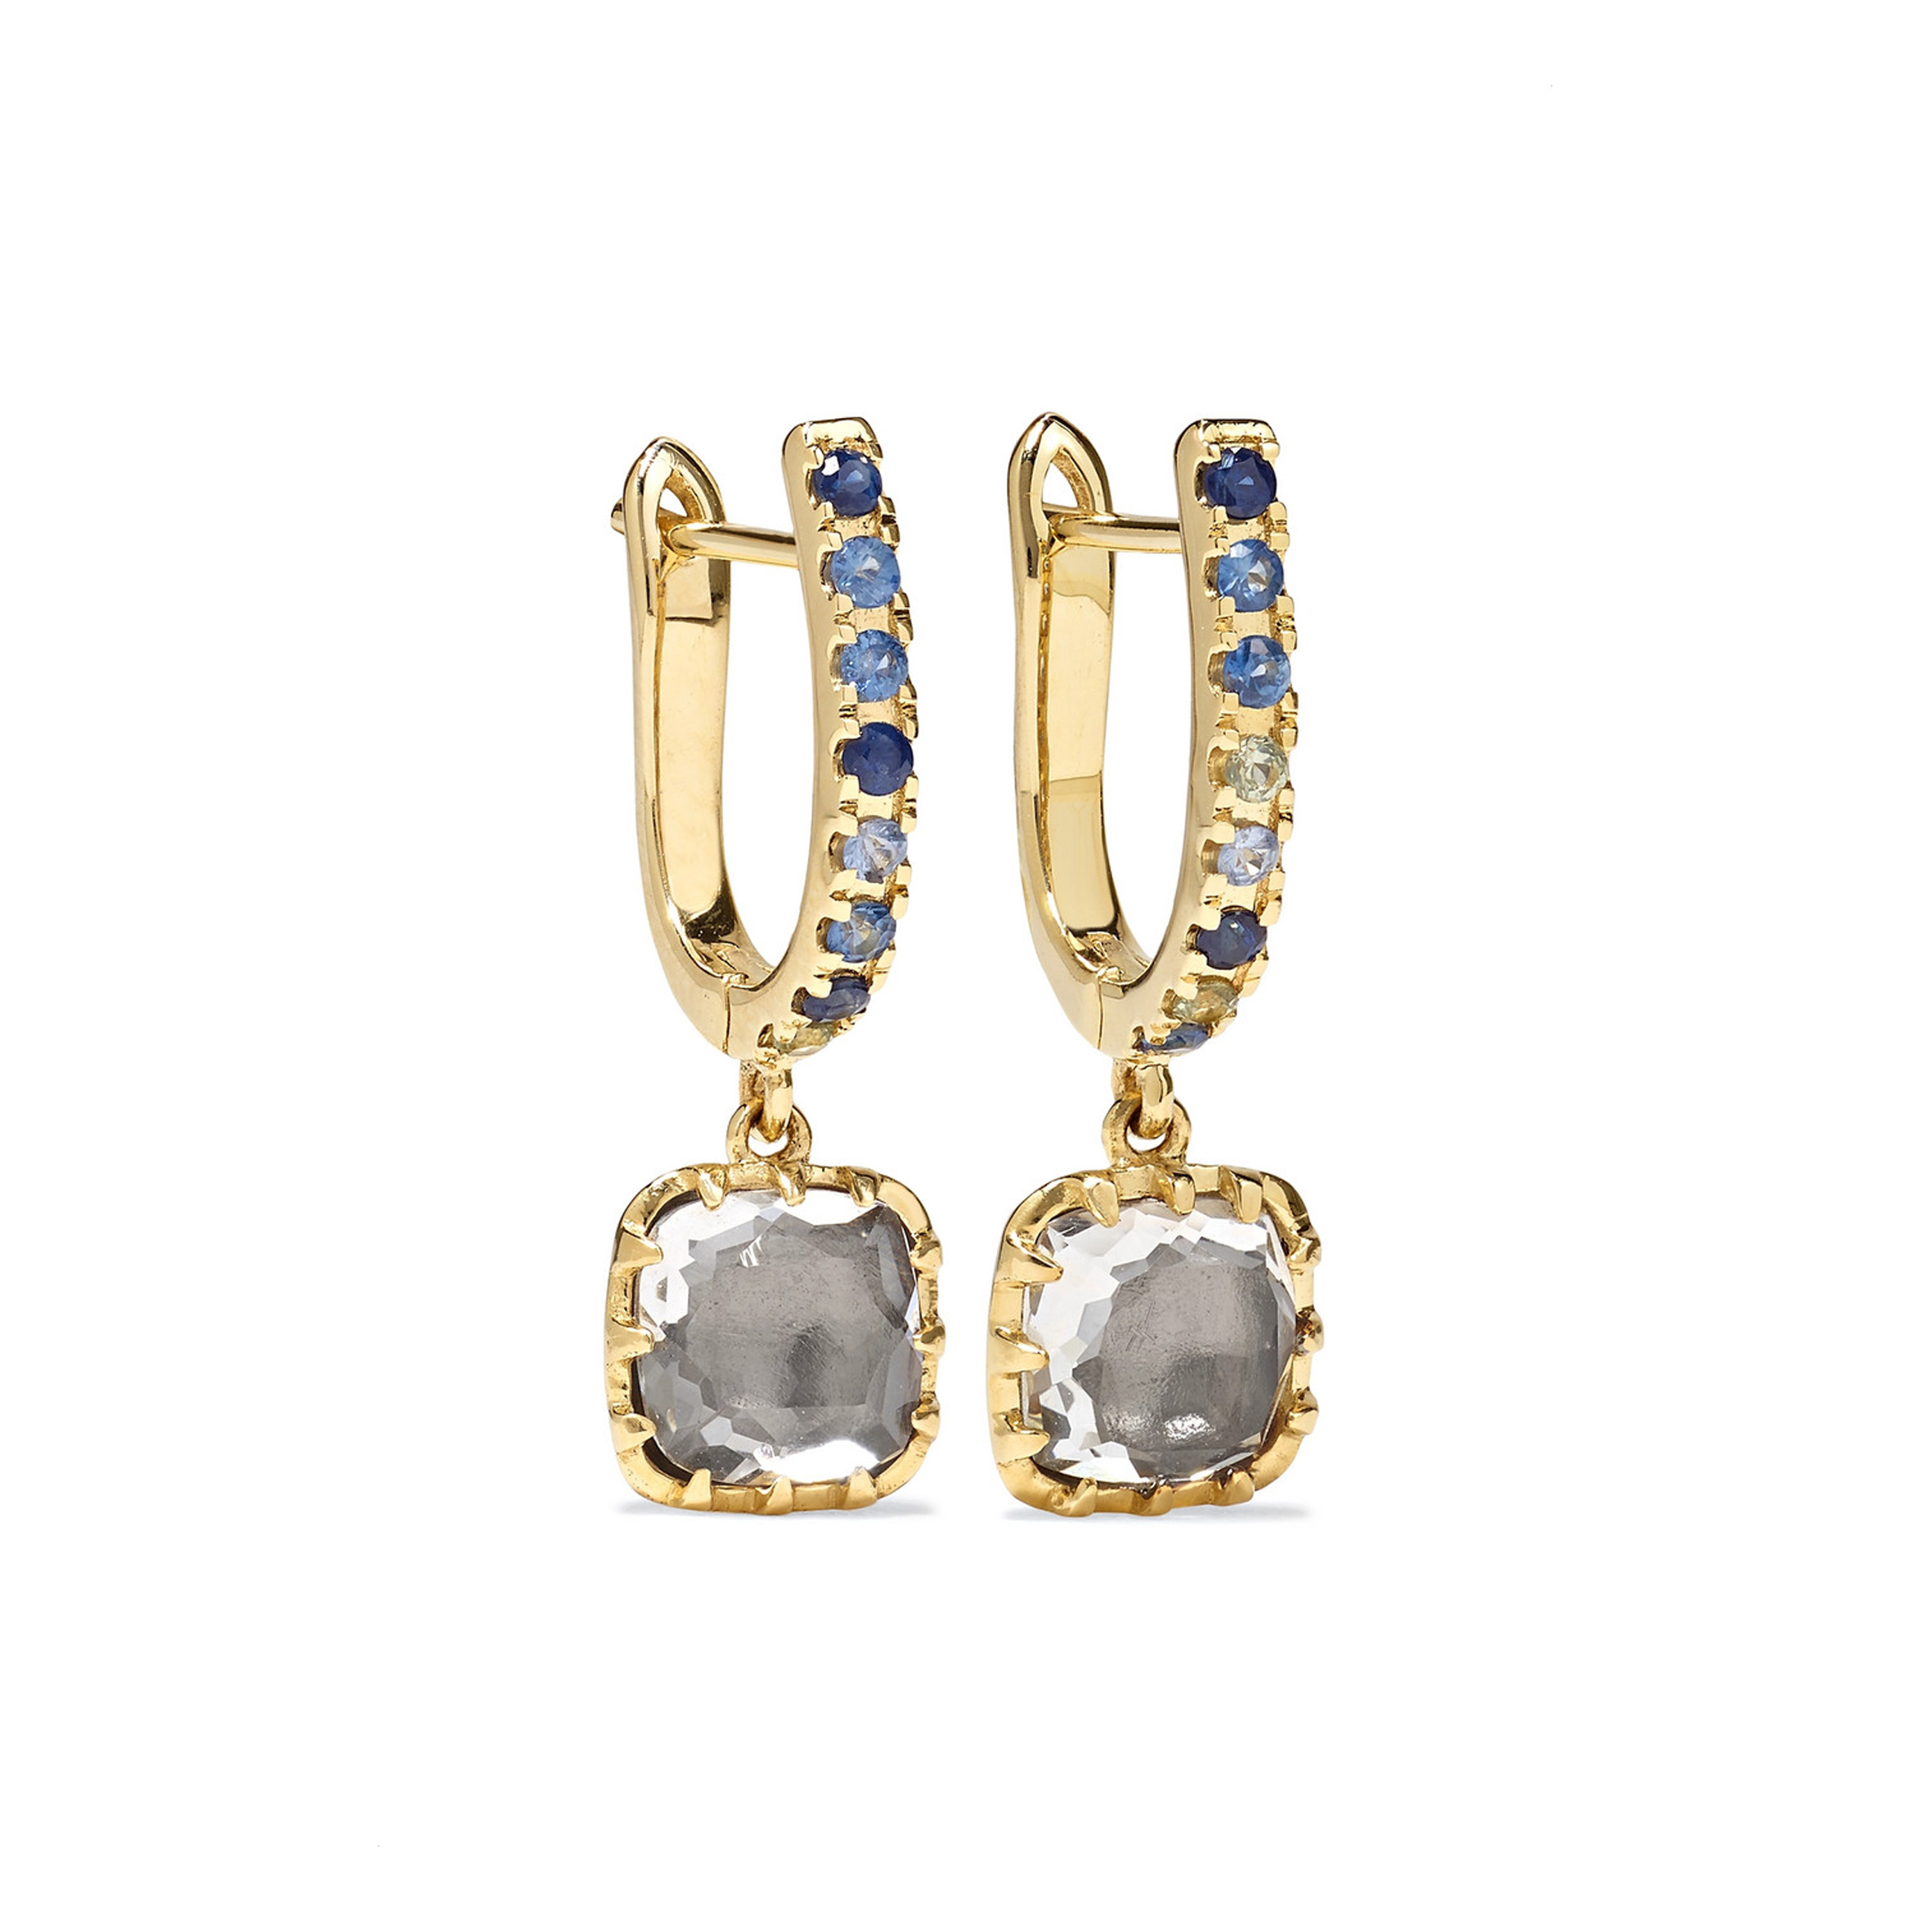 Larkspur & Hawk - Caprice Elements 14-karat gold, quartz and sapphire earrings | SGD 2,100